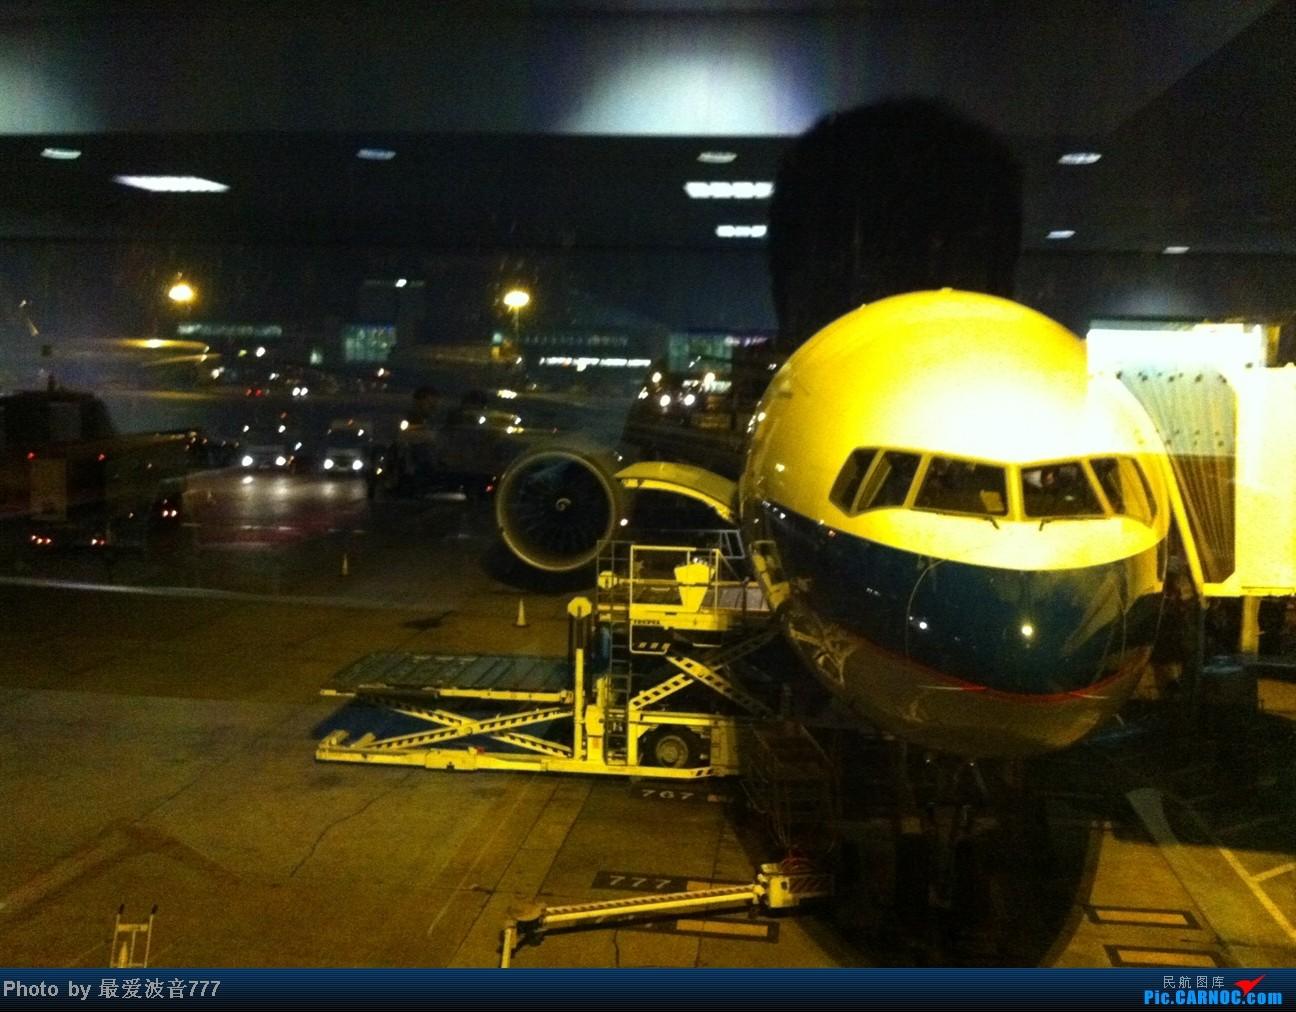 Re:[原创]假期的回国往返之旅 LHR-HKG-CTU-HKG-LHR, CX+CA+KA联合运营 BOEING 777-300 B-KPW 英国伦敦希思罗机场